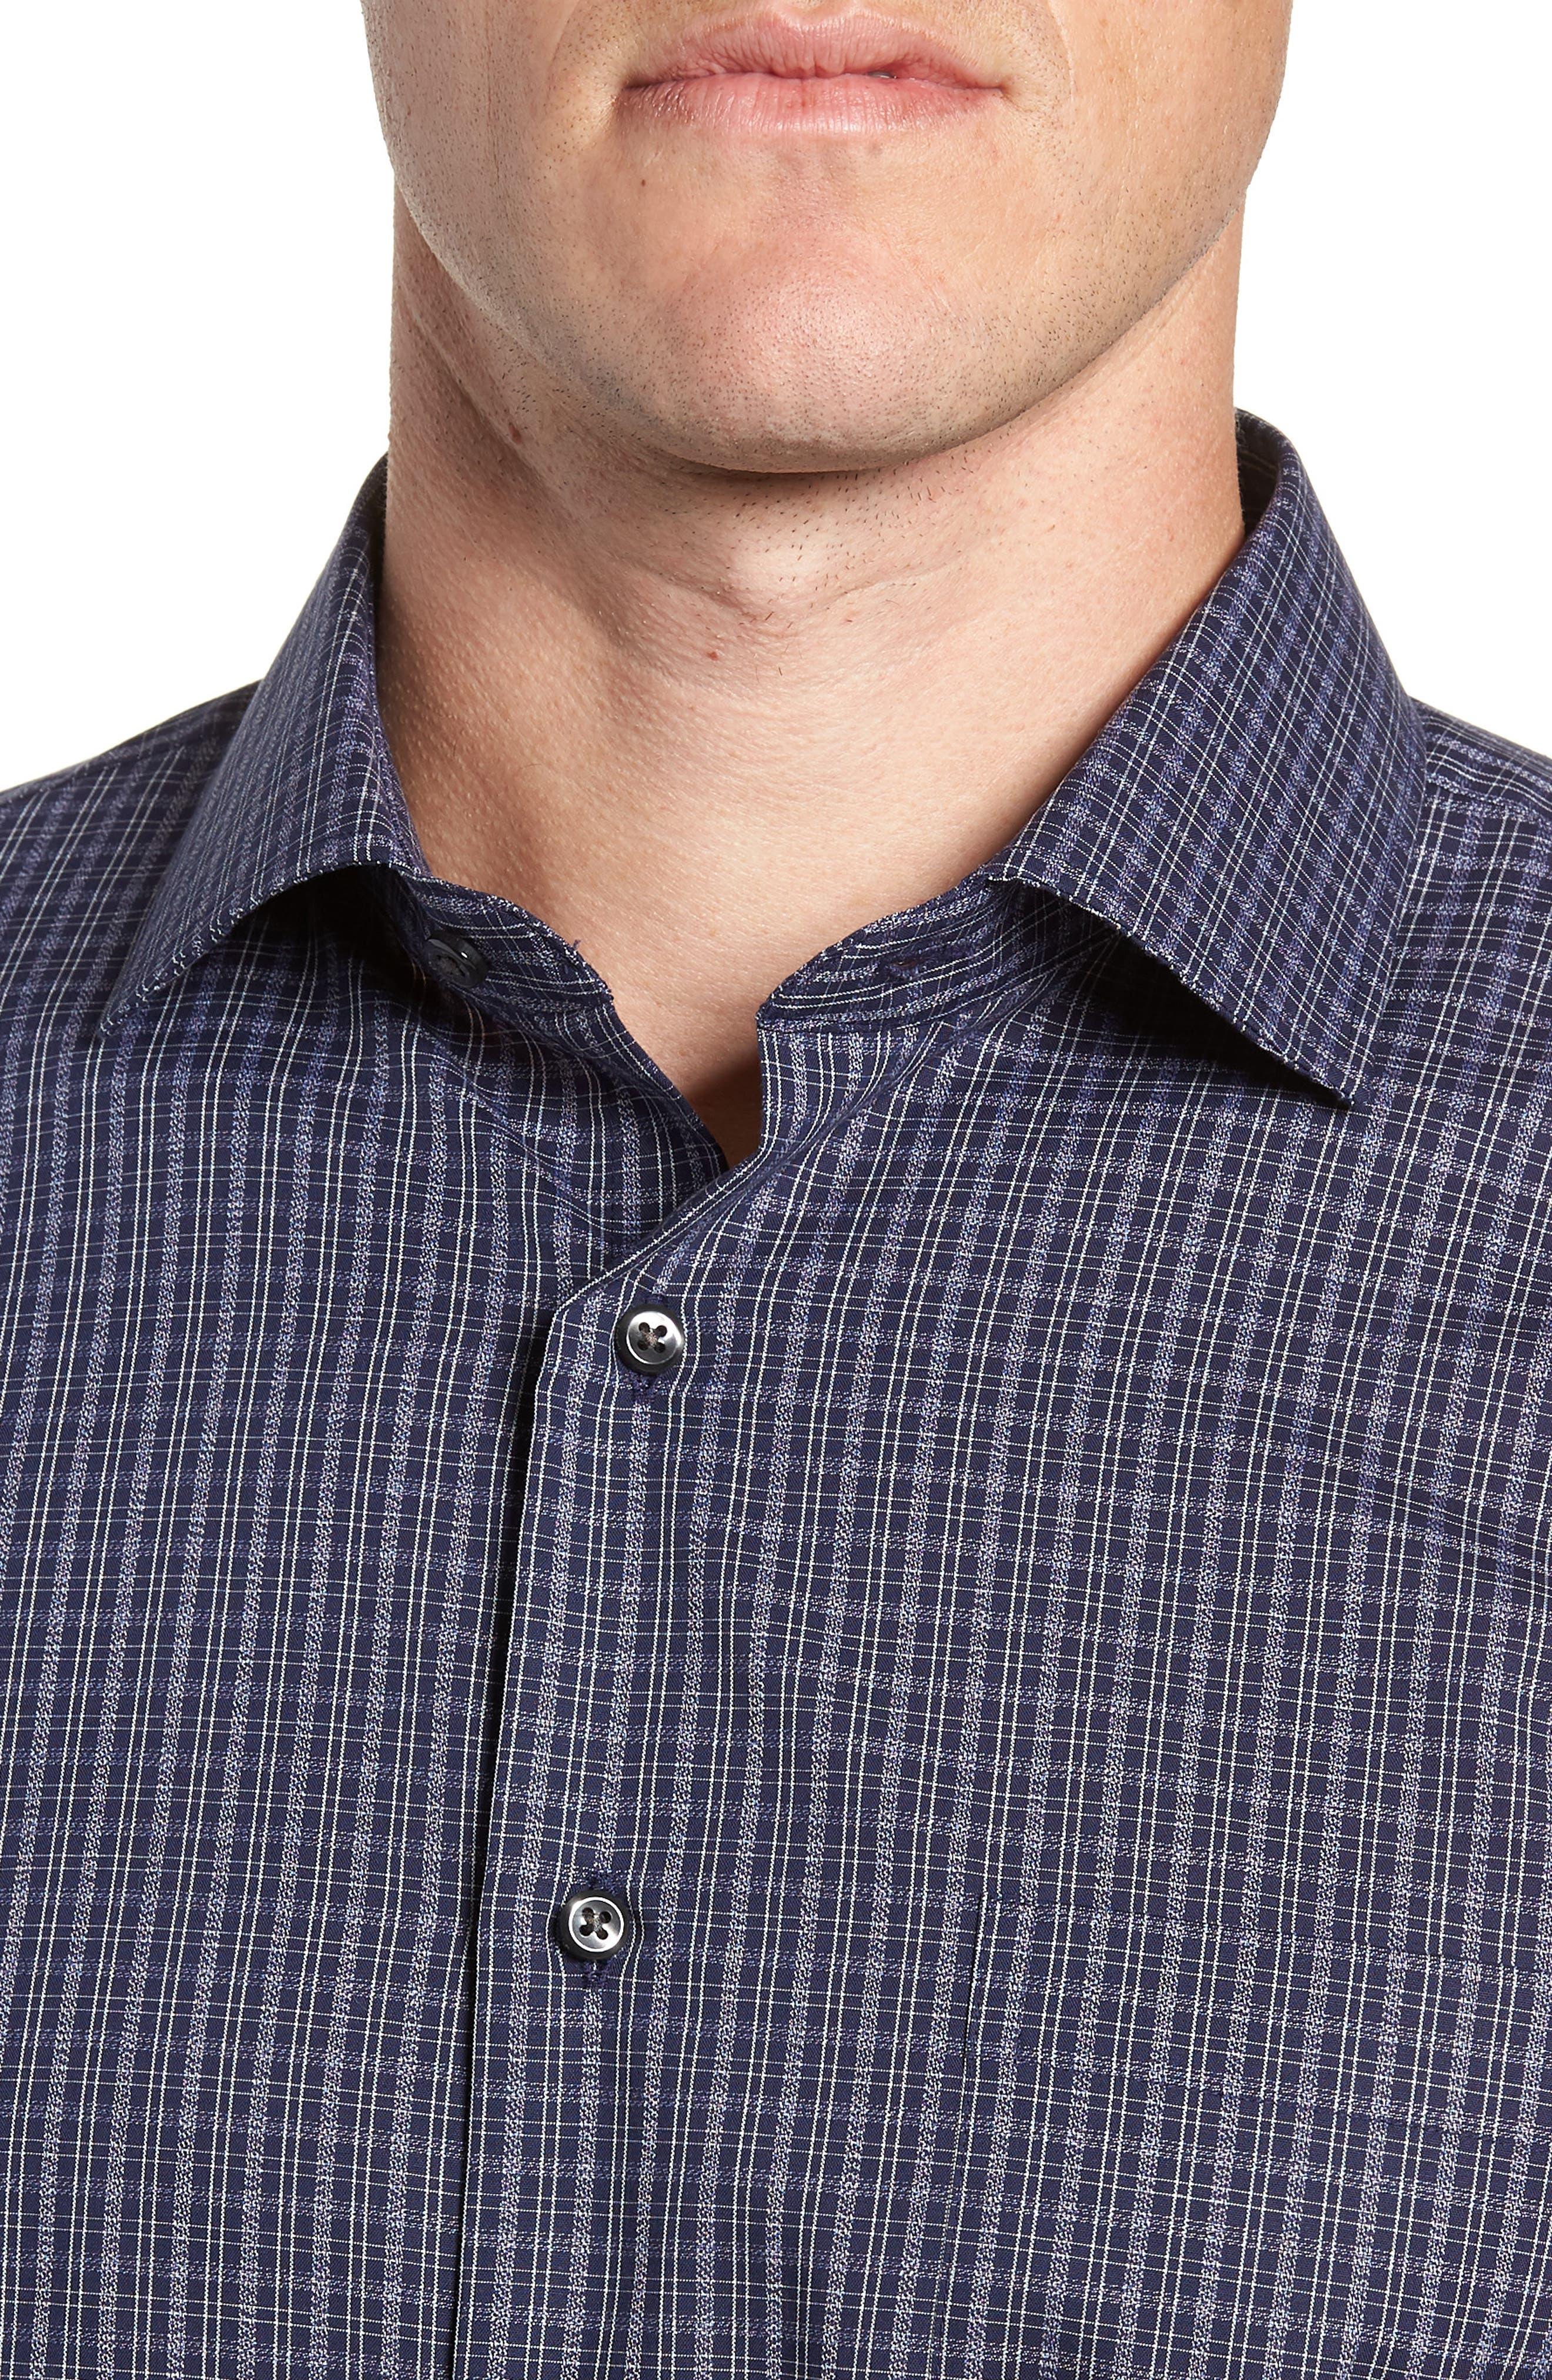 Trim Fit Non-Iron Plaid Dress Shirt,                             Alternate thumbnail 2, color,                             NAVY NIGHT